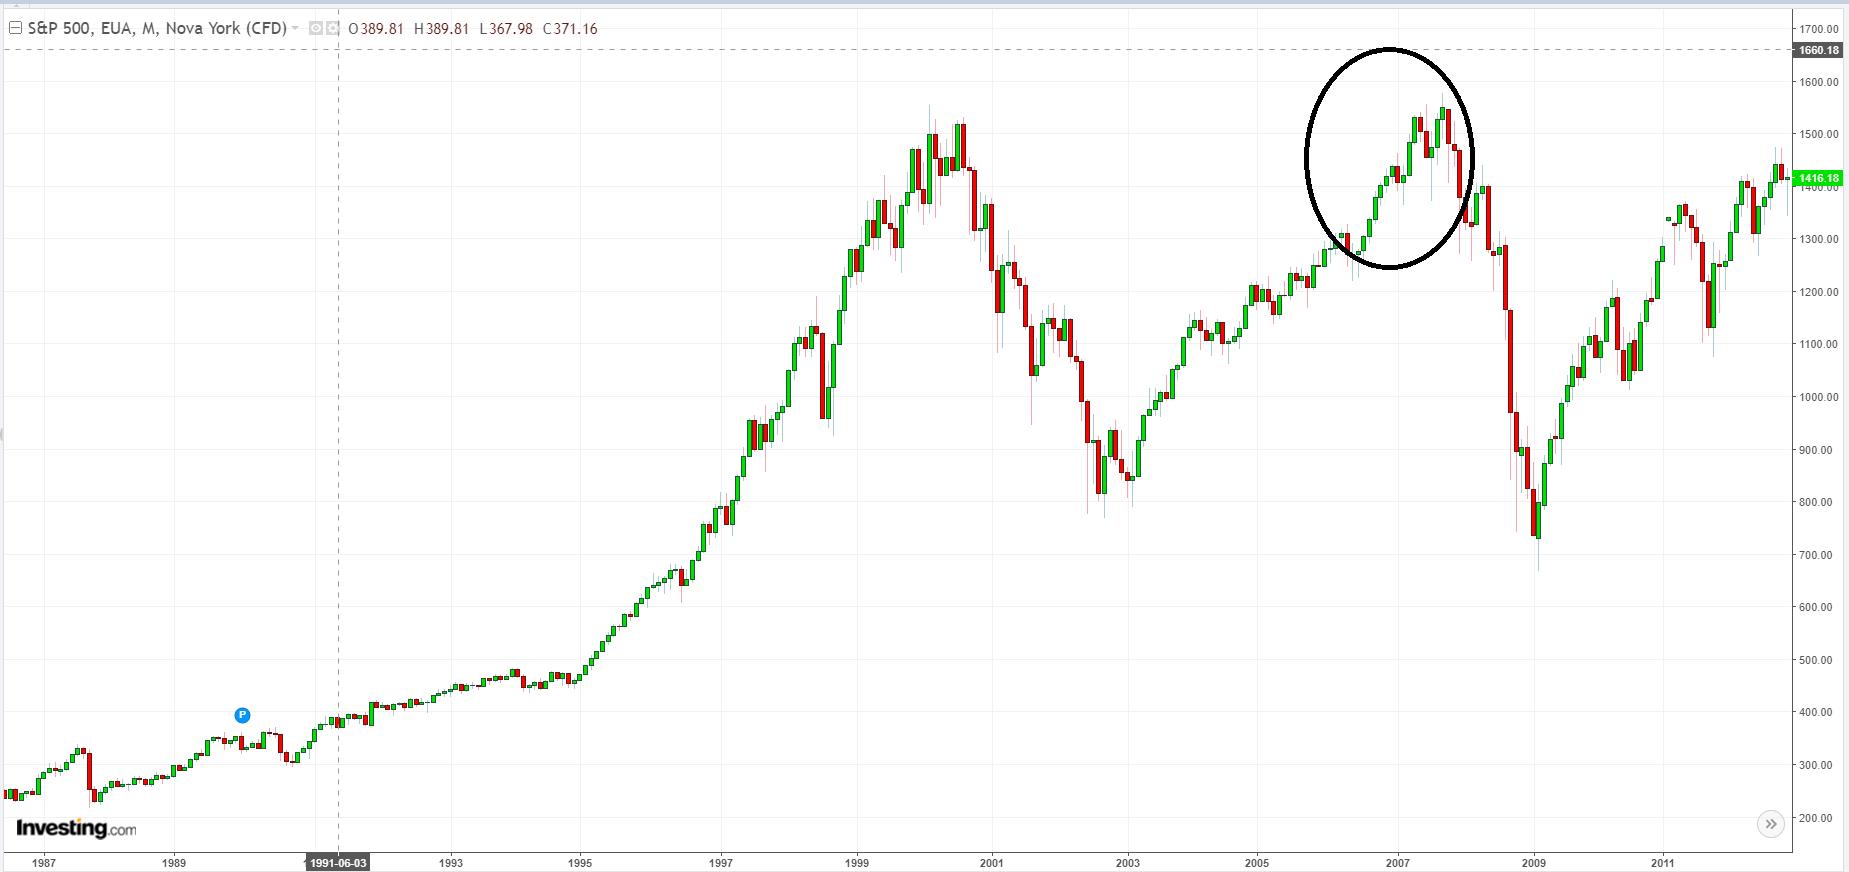 S&P 500 - Principal índice de ações americano.